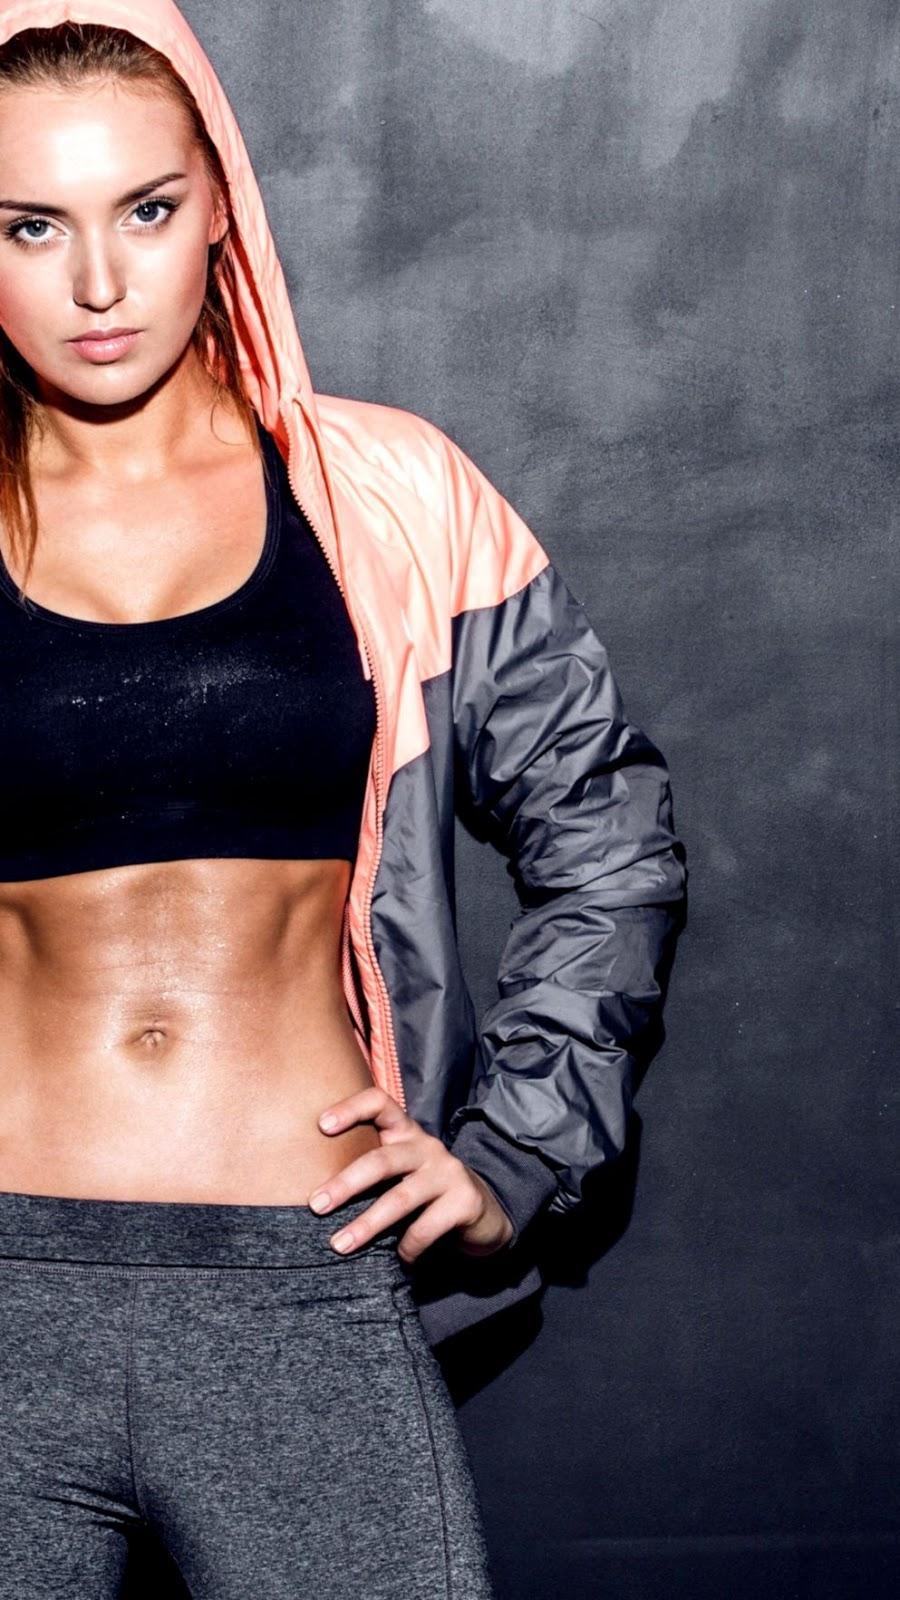 Girl Blonde Fitness Hd Wallpaper Lock Wallpapers